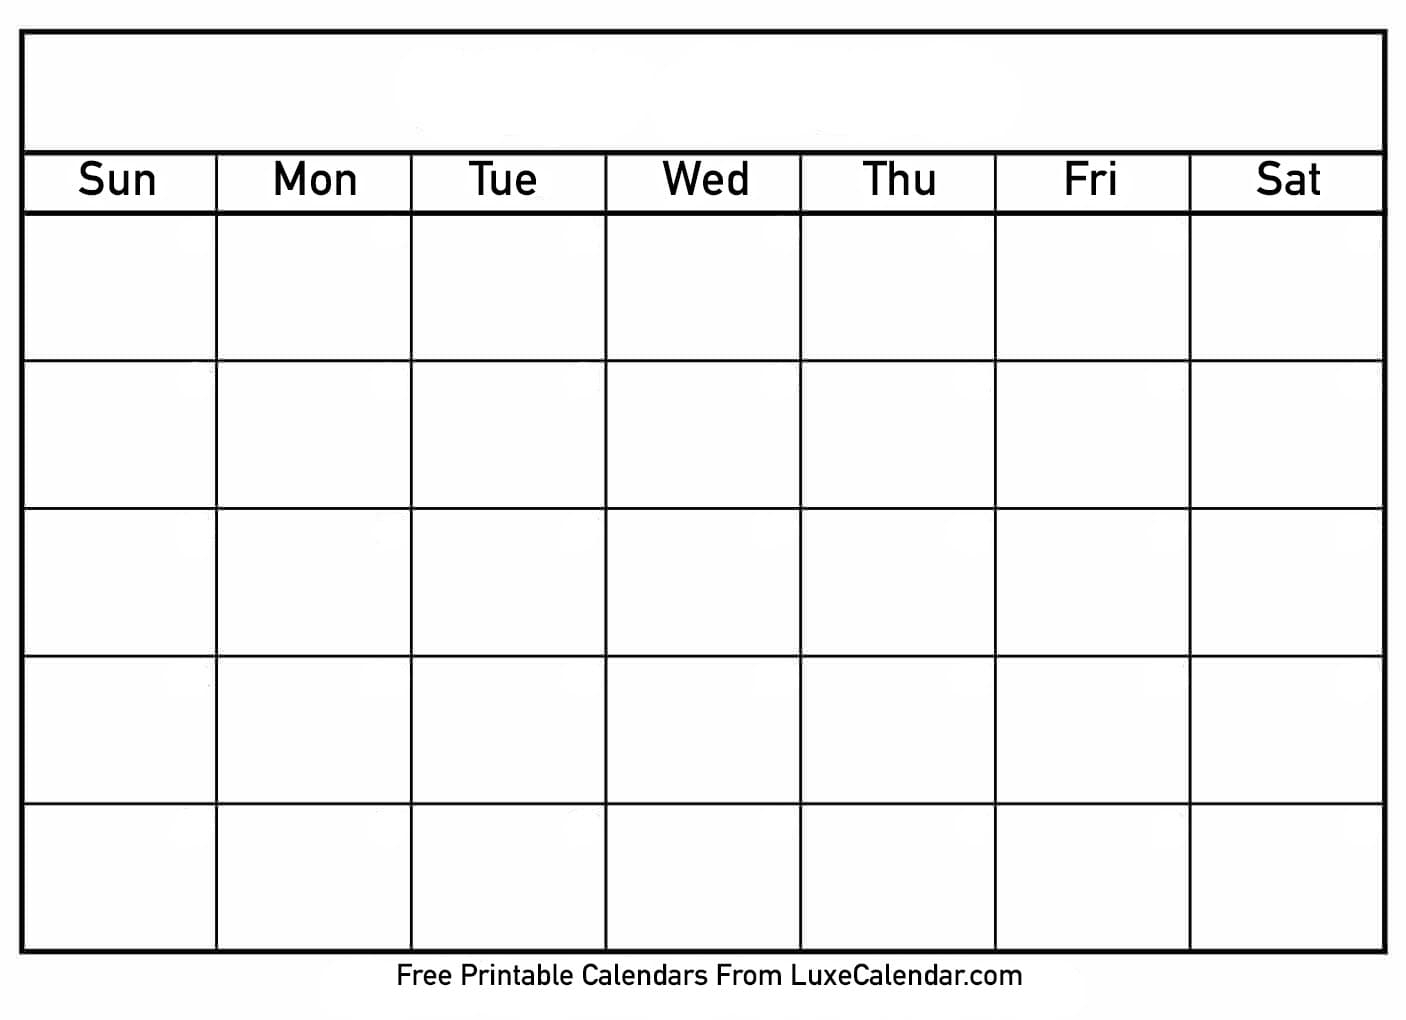 Blank Printable Calendar - Luxe Calendar inside Free Printable Blank Calendar Templates